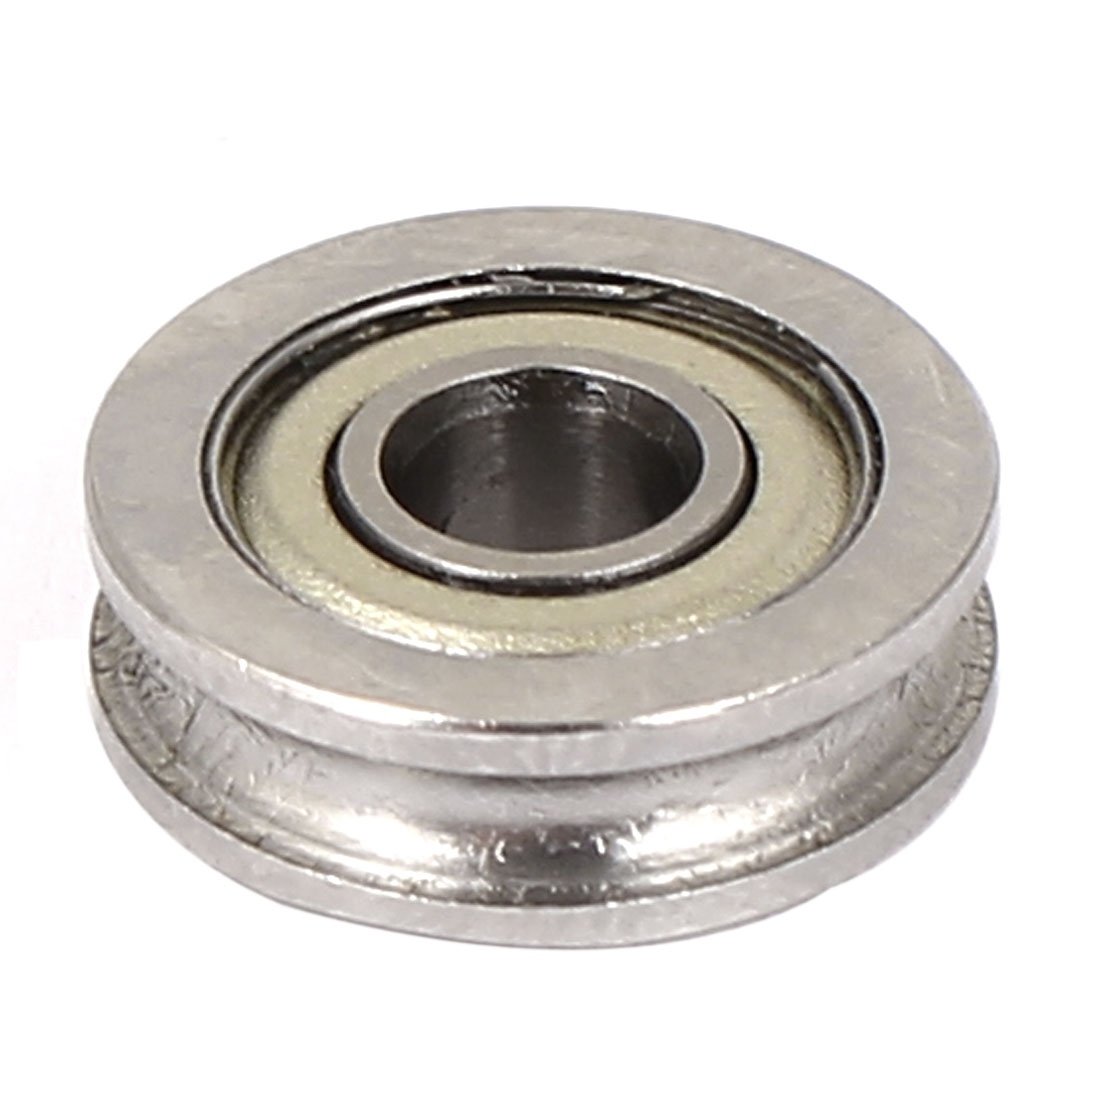 13mm x 4mm x 4mm U604ZZ Shields Deep Groove Flanged Ball Bearing